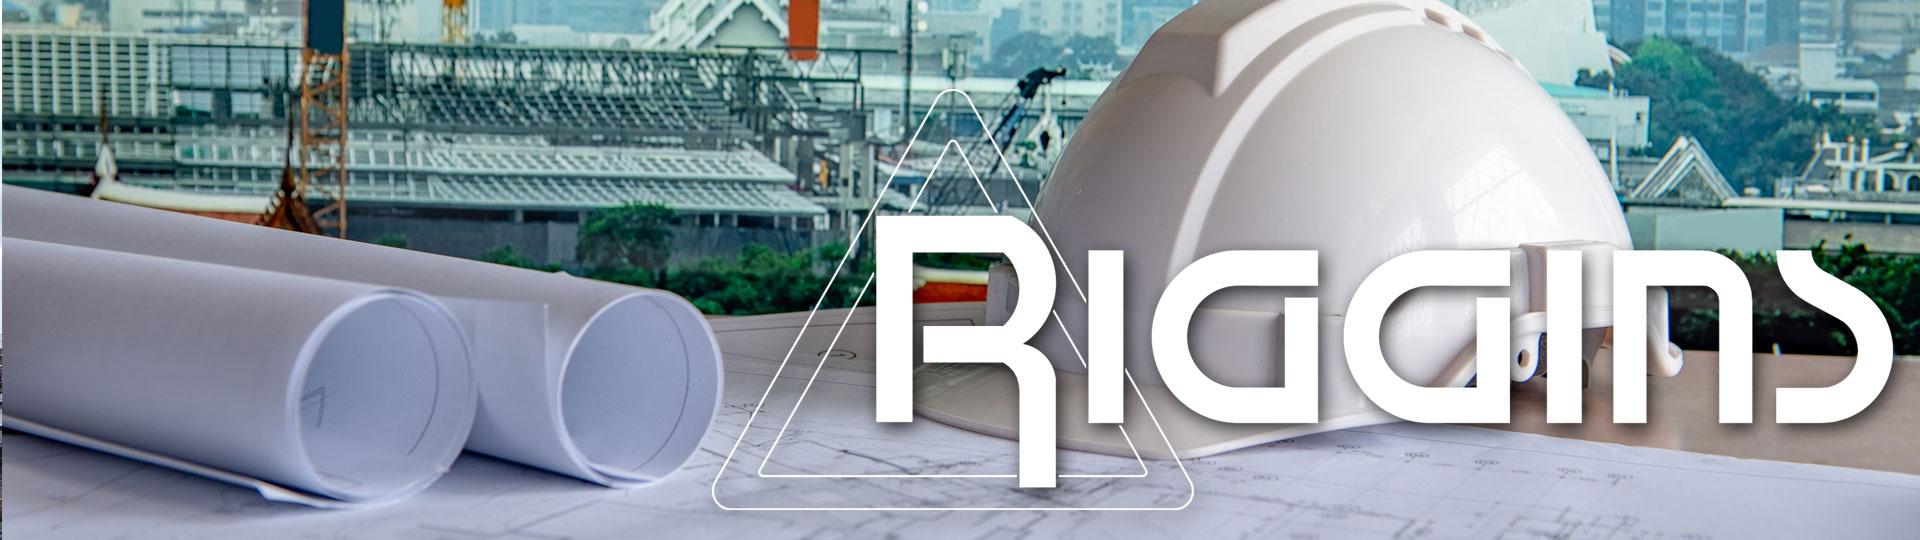 Riggins Professional Project Management